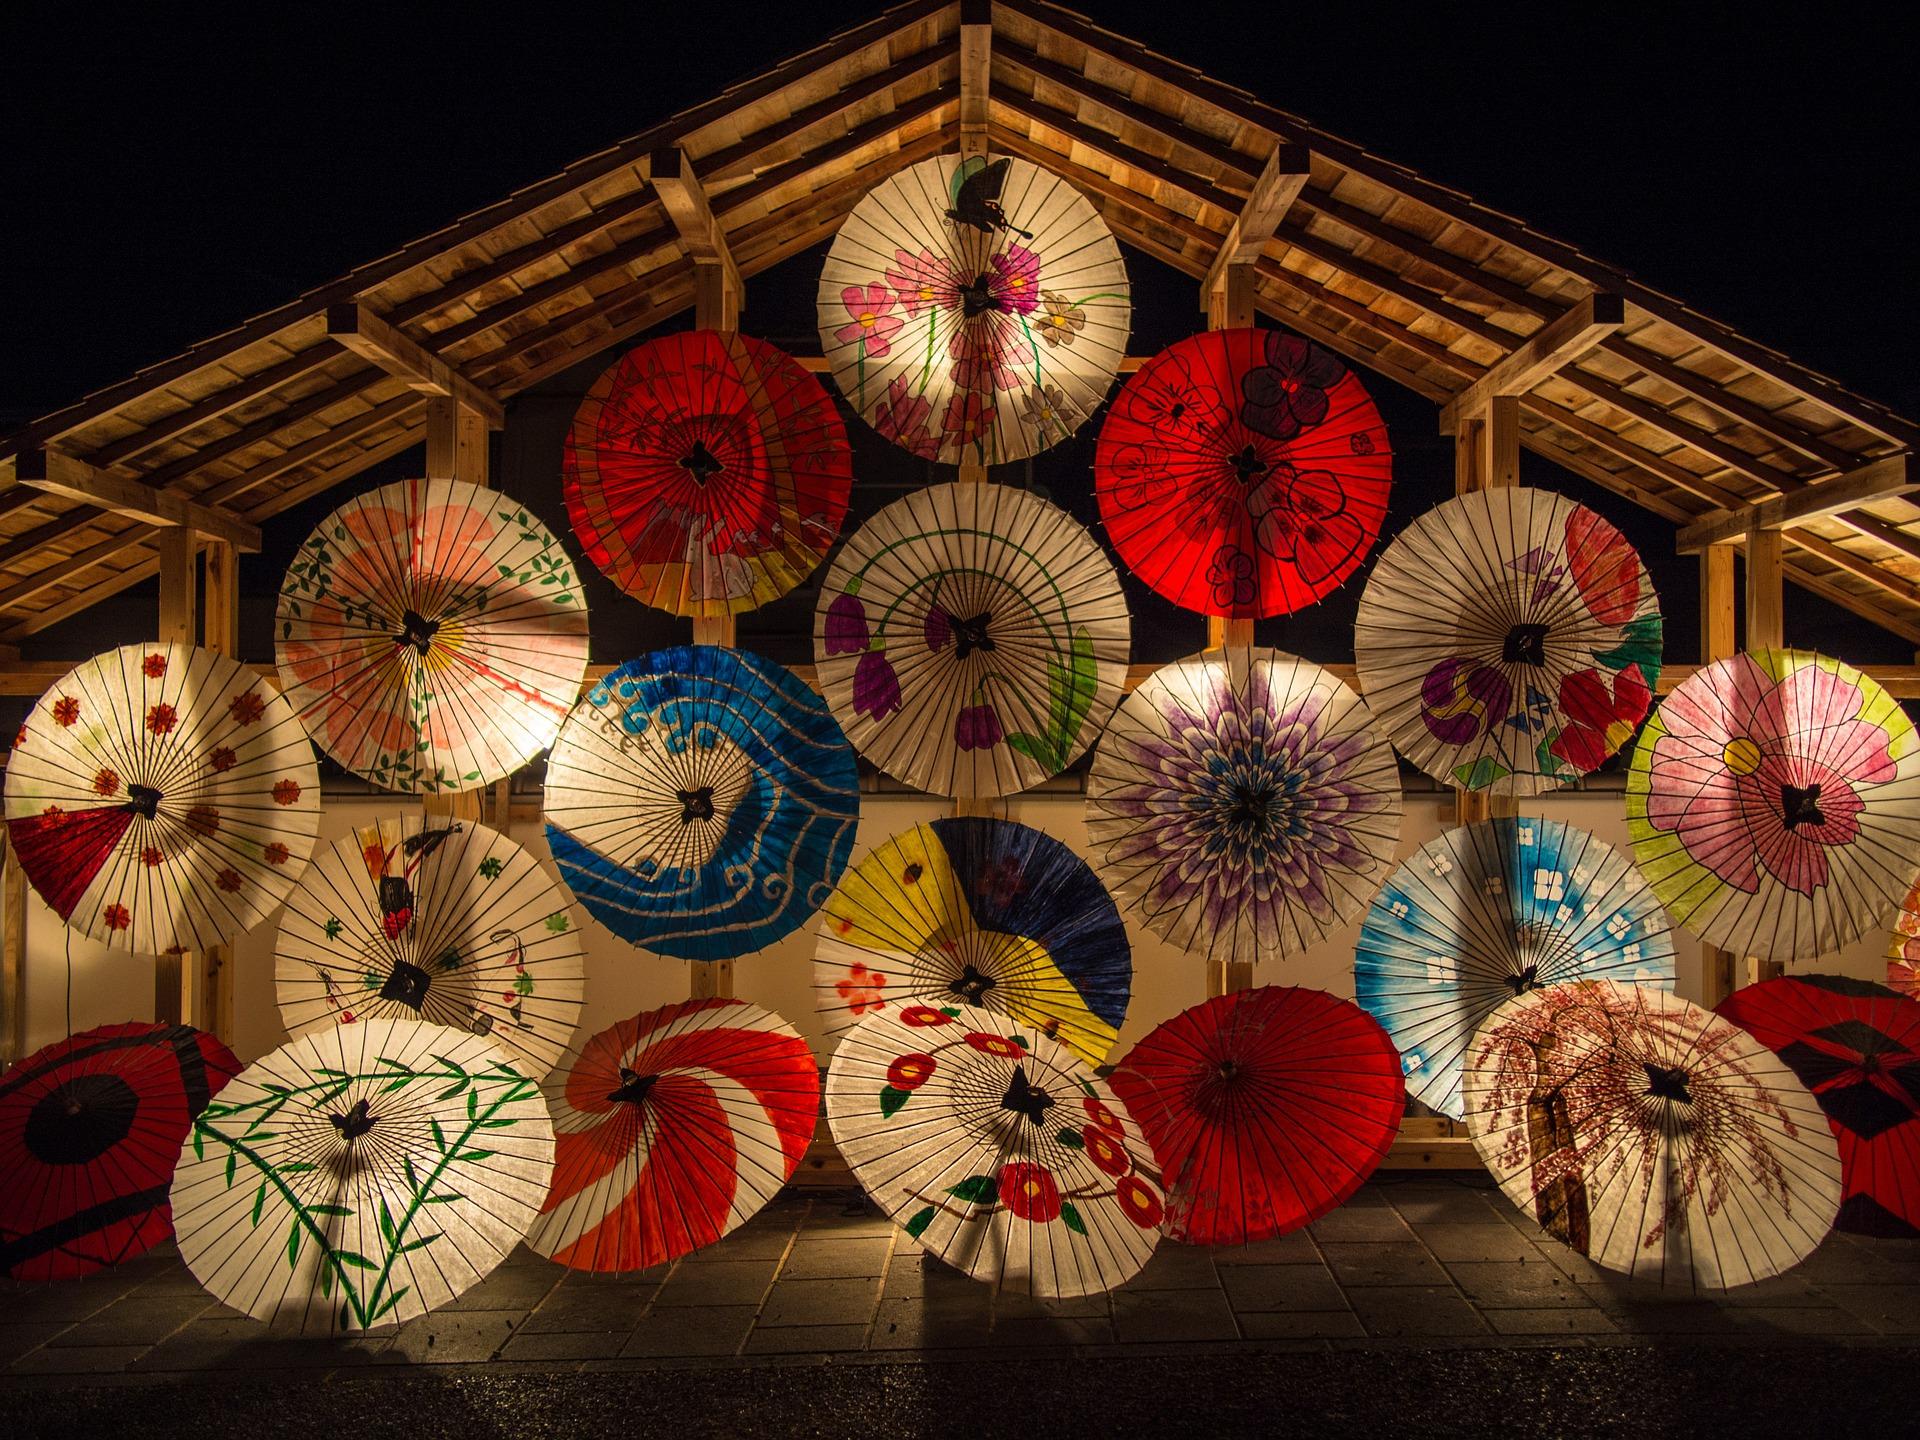 japanese-umbrellas-636870_1920.jpg